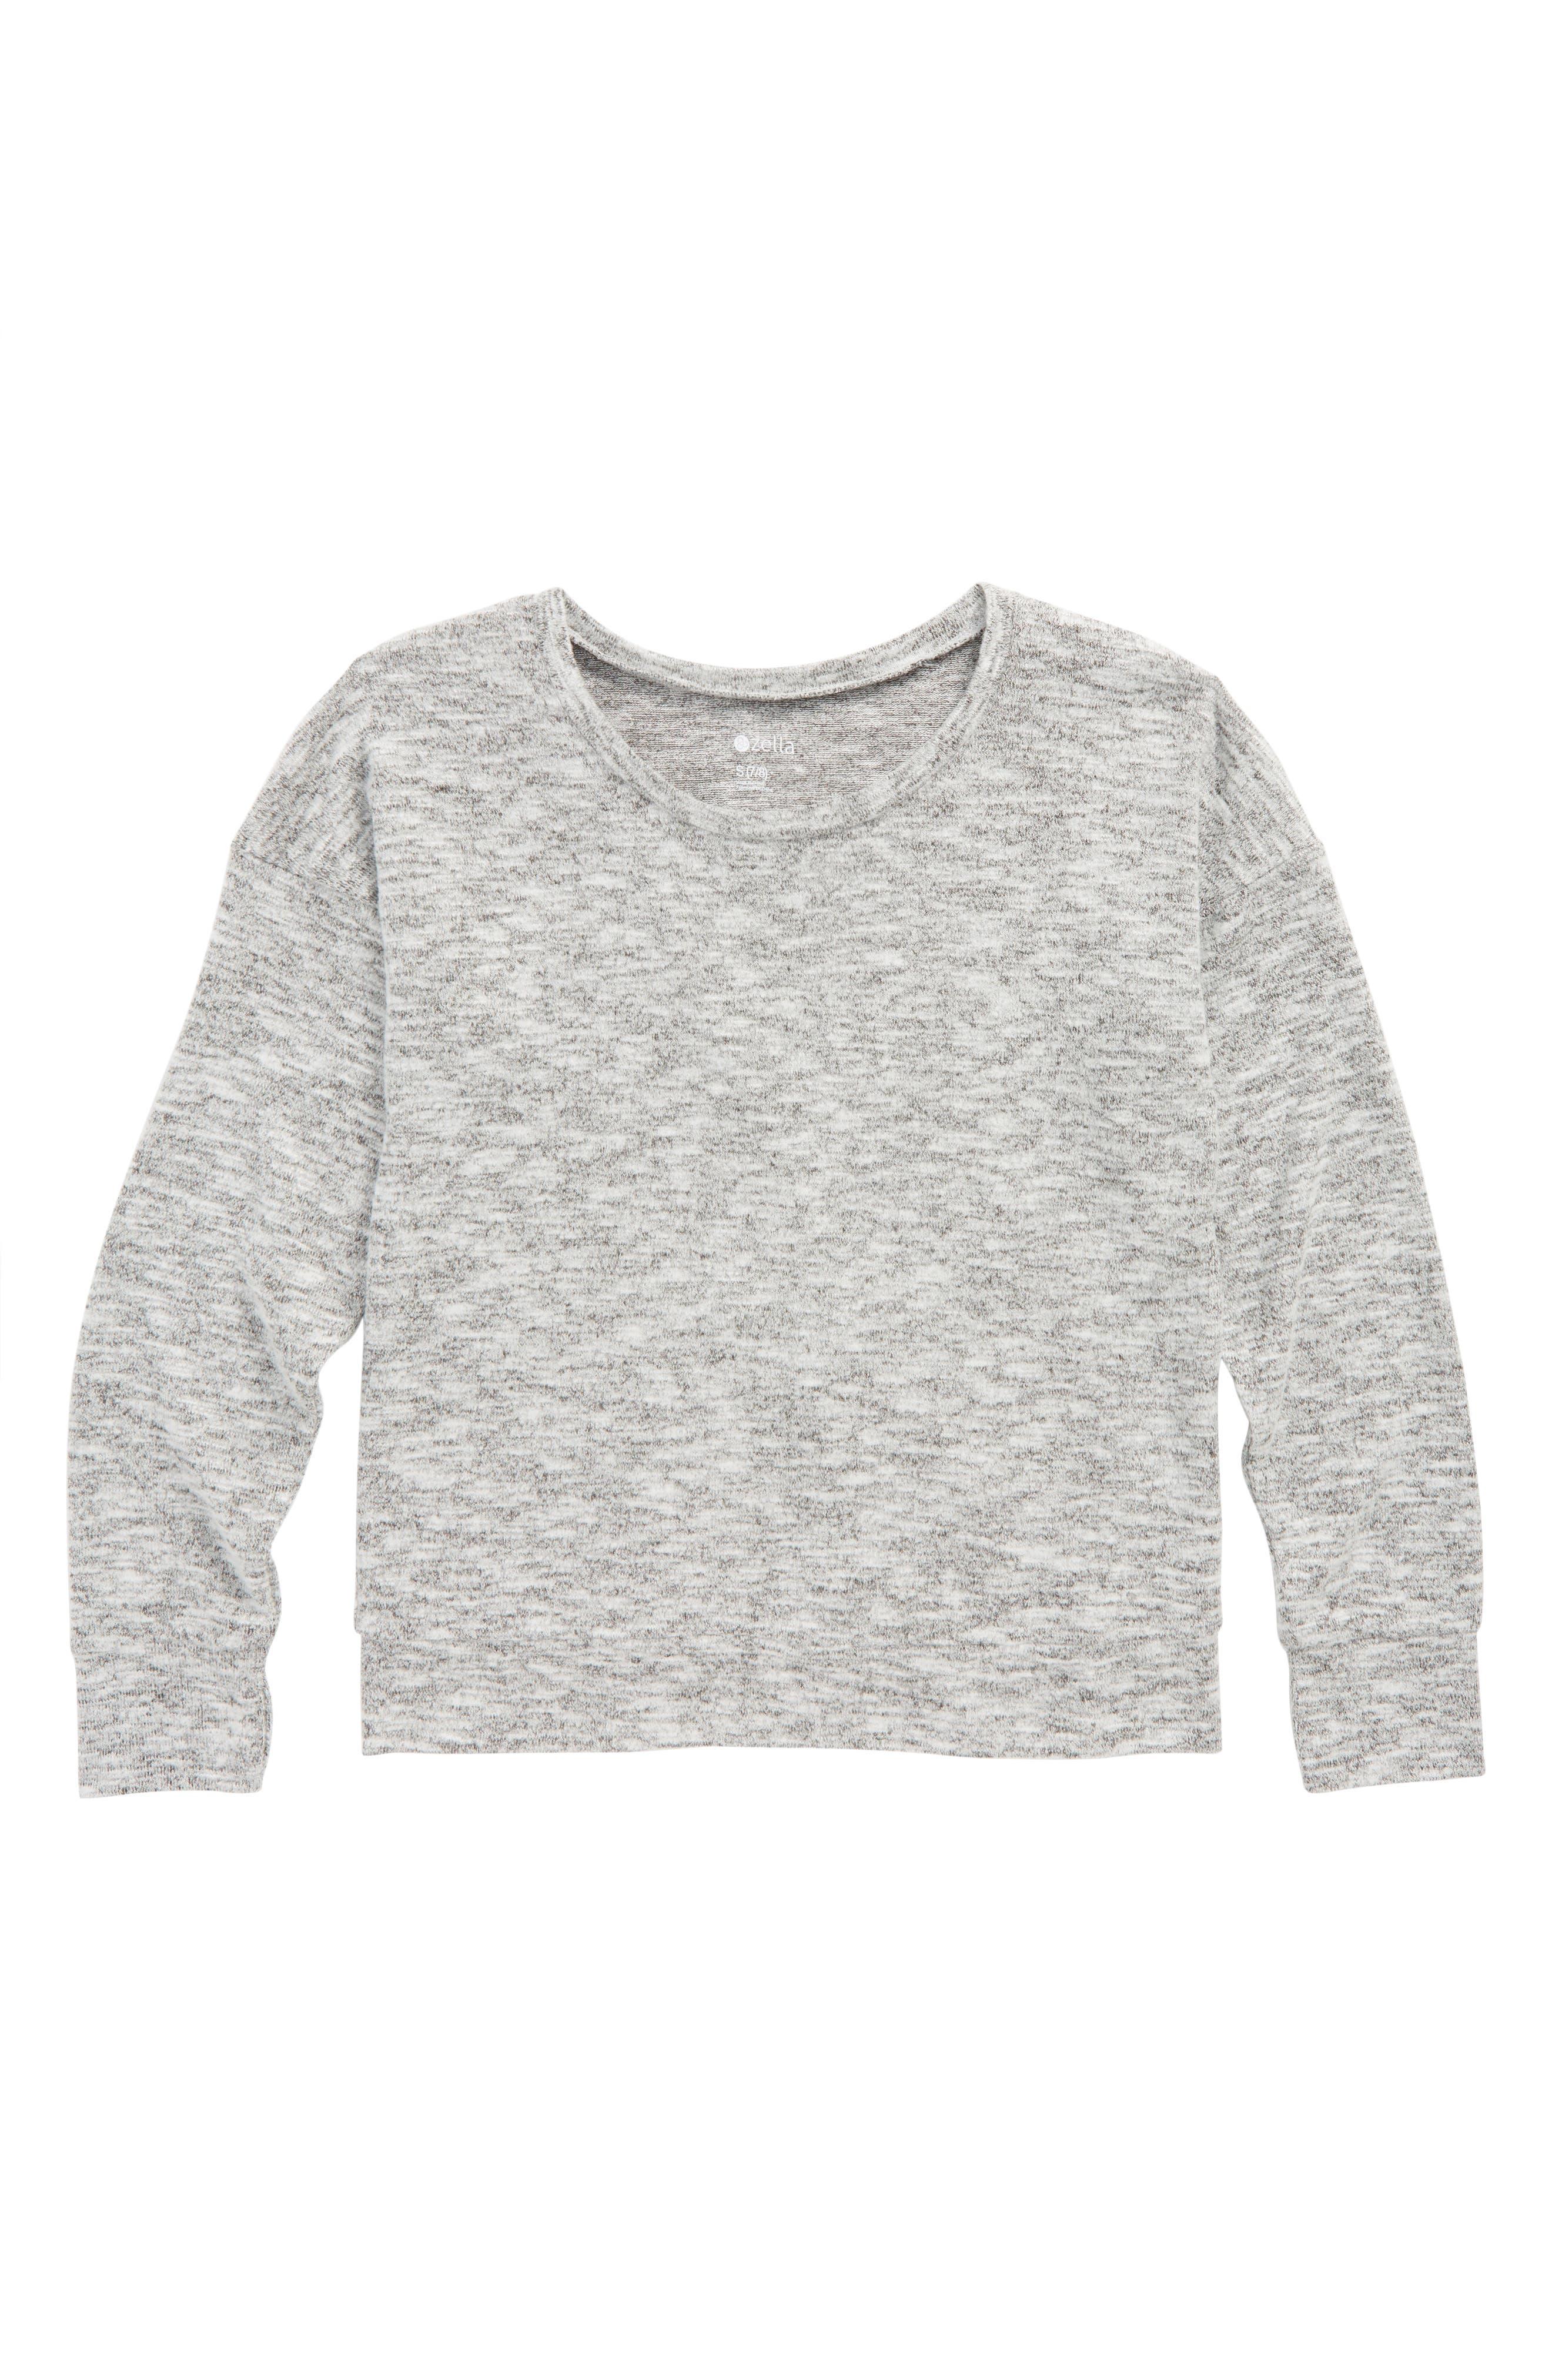 Zella Open Back Sweater,                             Main thumbnail 1, color,                             001